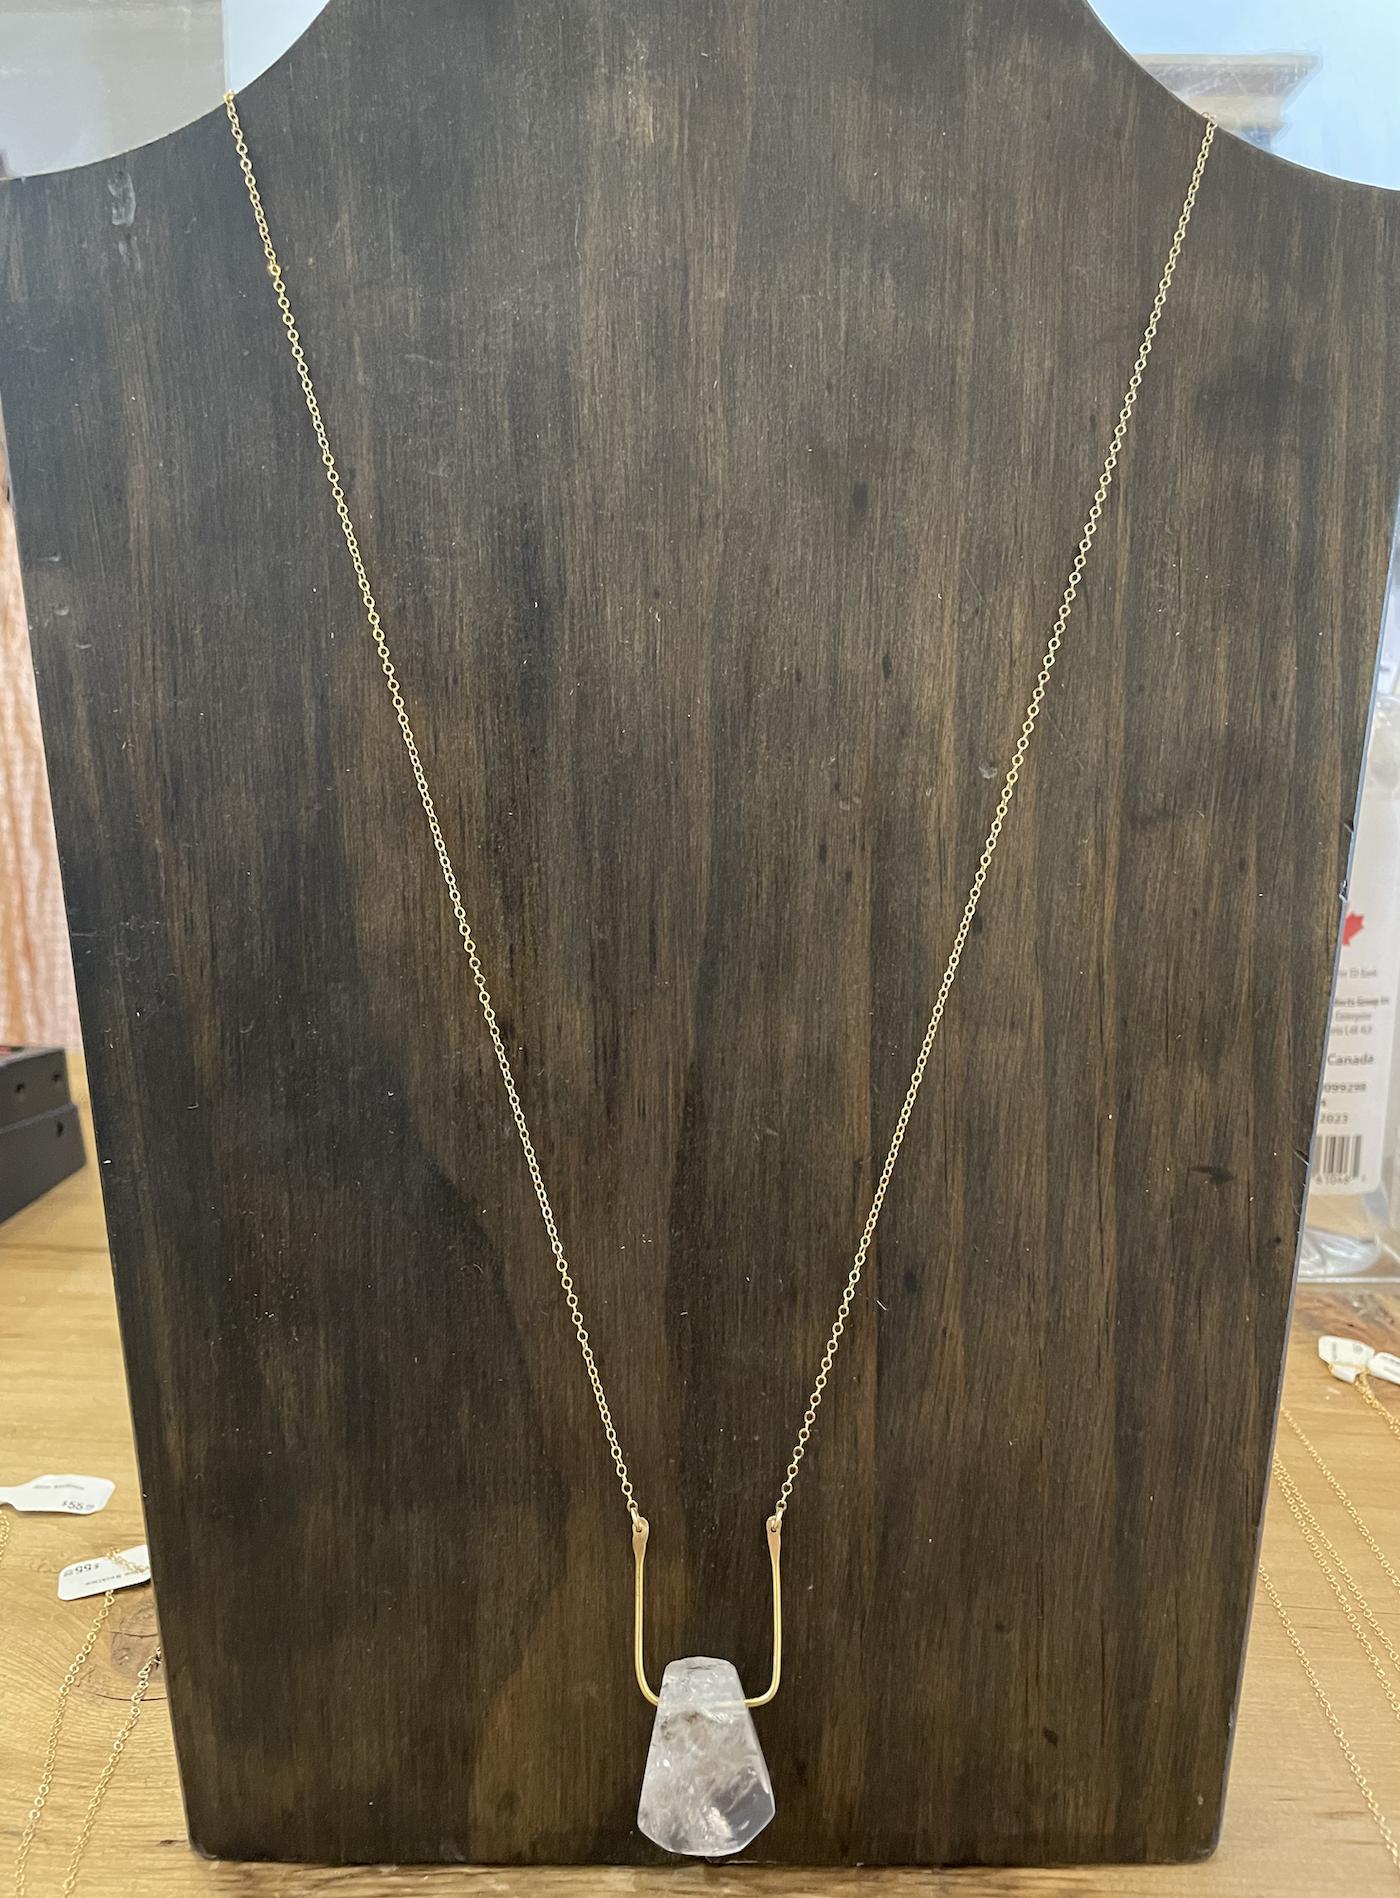 Metrix Jewelry Esme Necklace- White